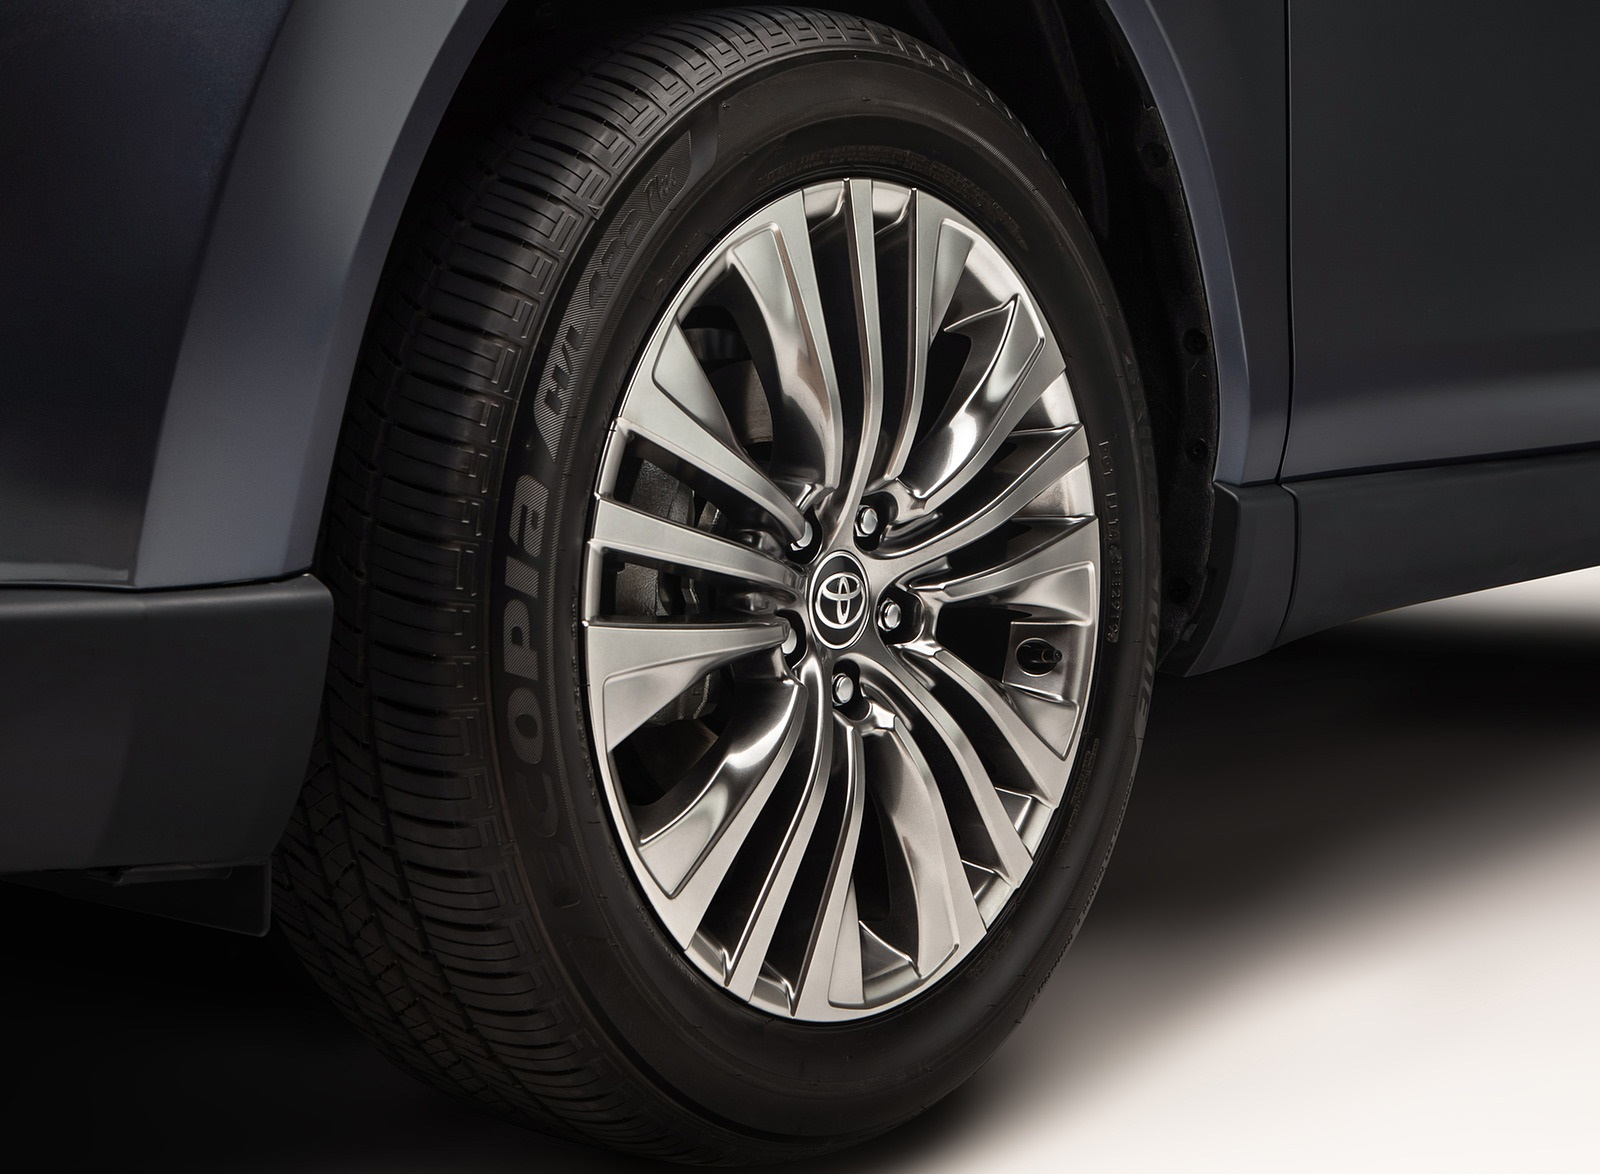 2021 Toyota Venza Wheel Wallpapers (6)